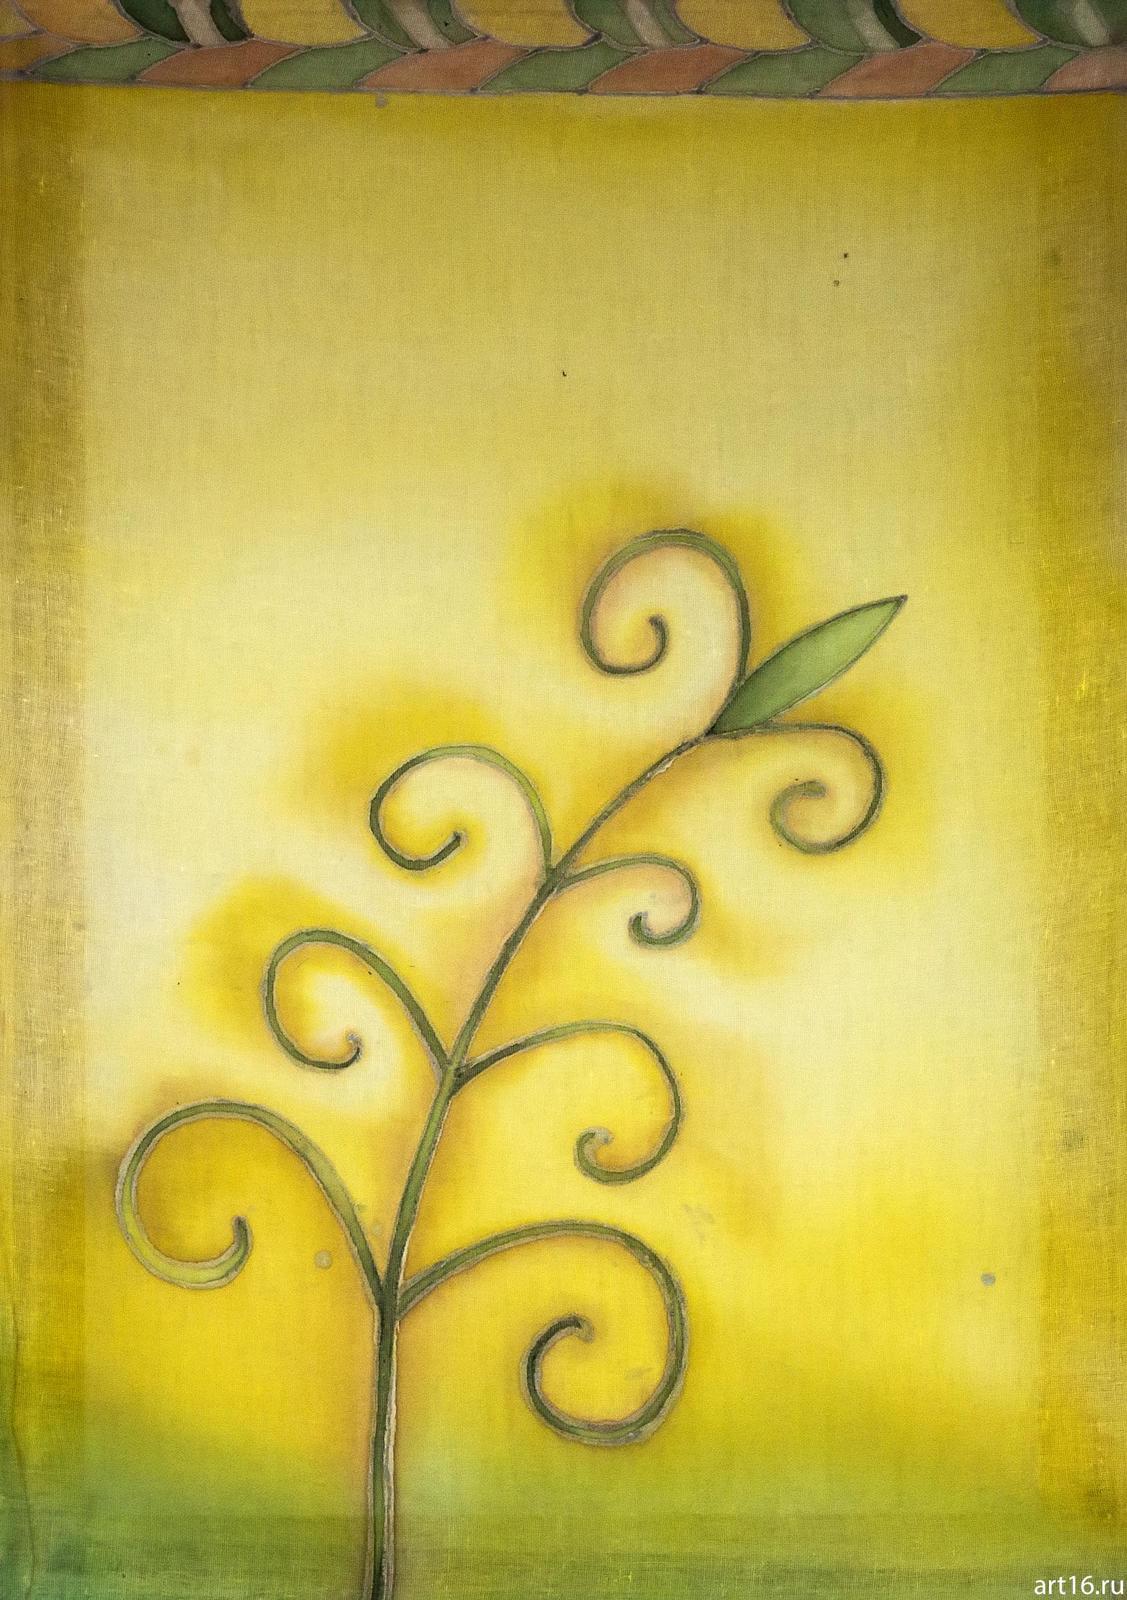 Фото №894870. Батик «Травинка», Нина Кузьминых, 1956